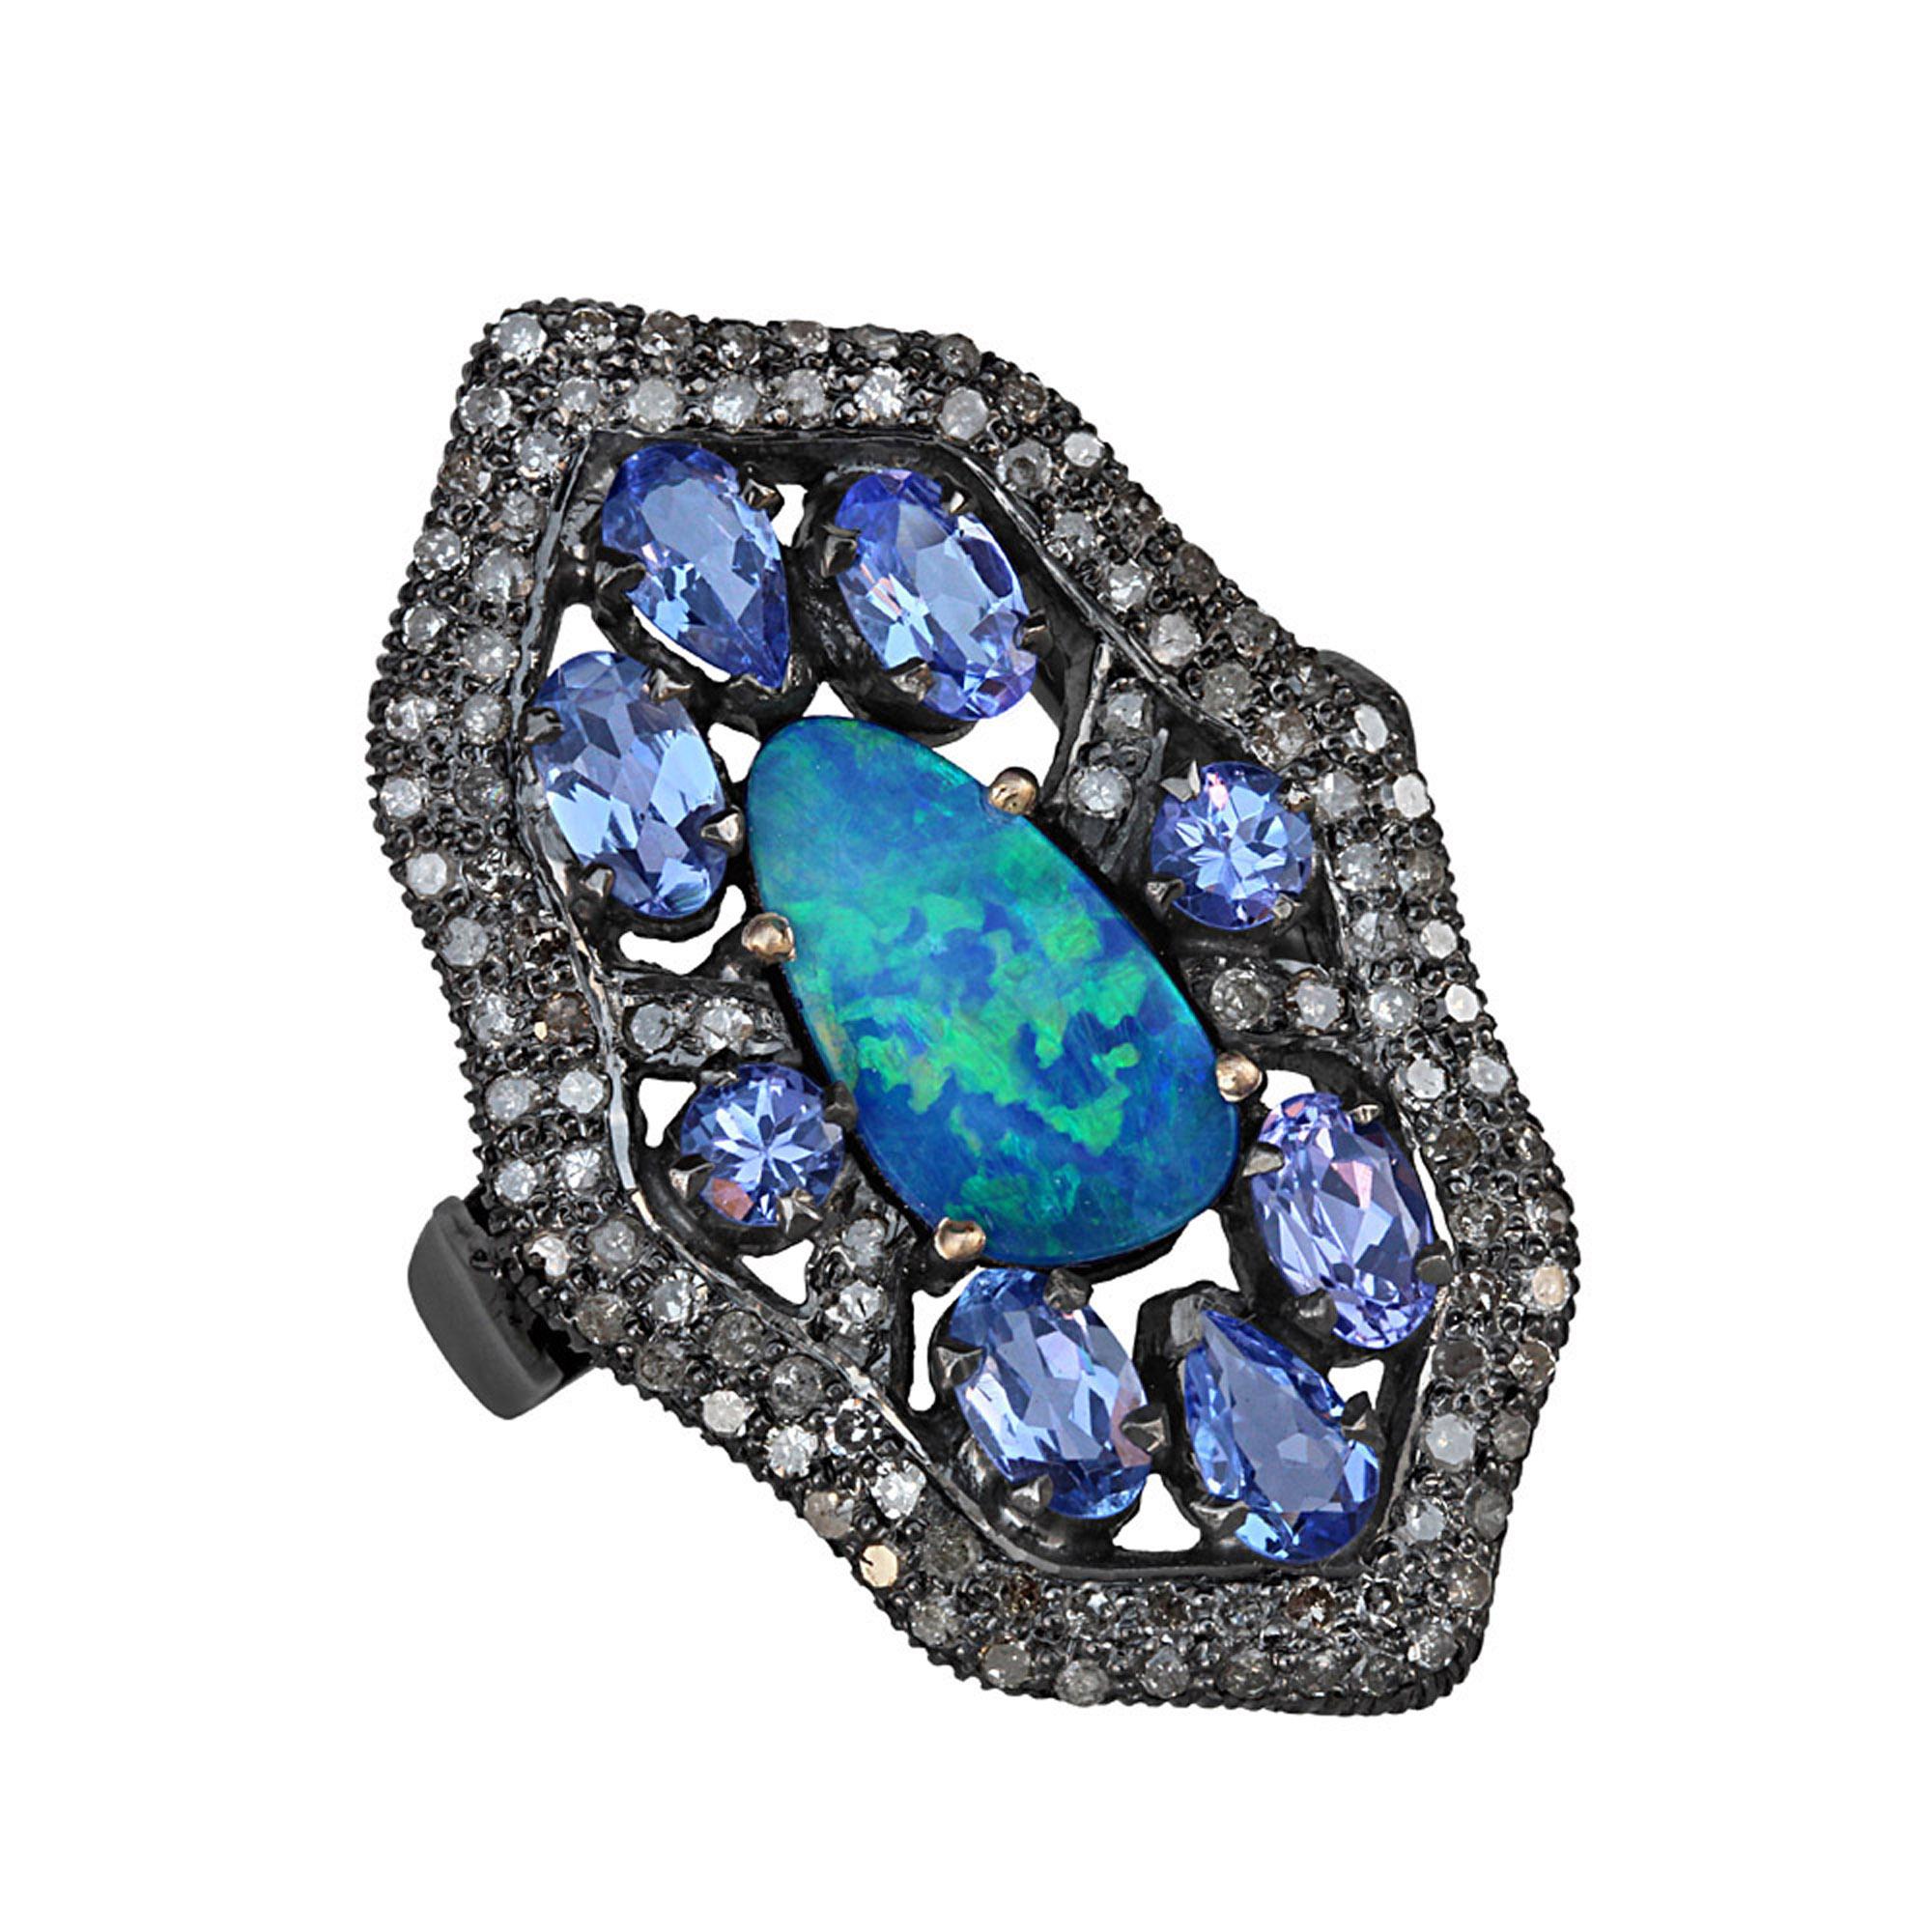 Diamond 14k gold 925 silver ring with opal & tanzanite